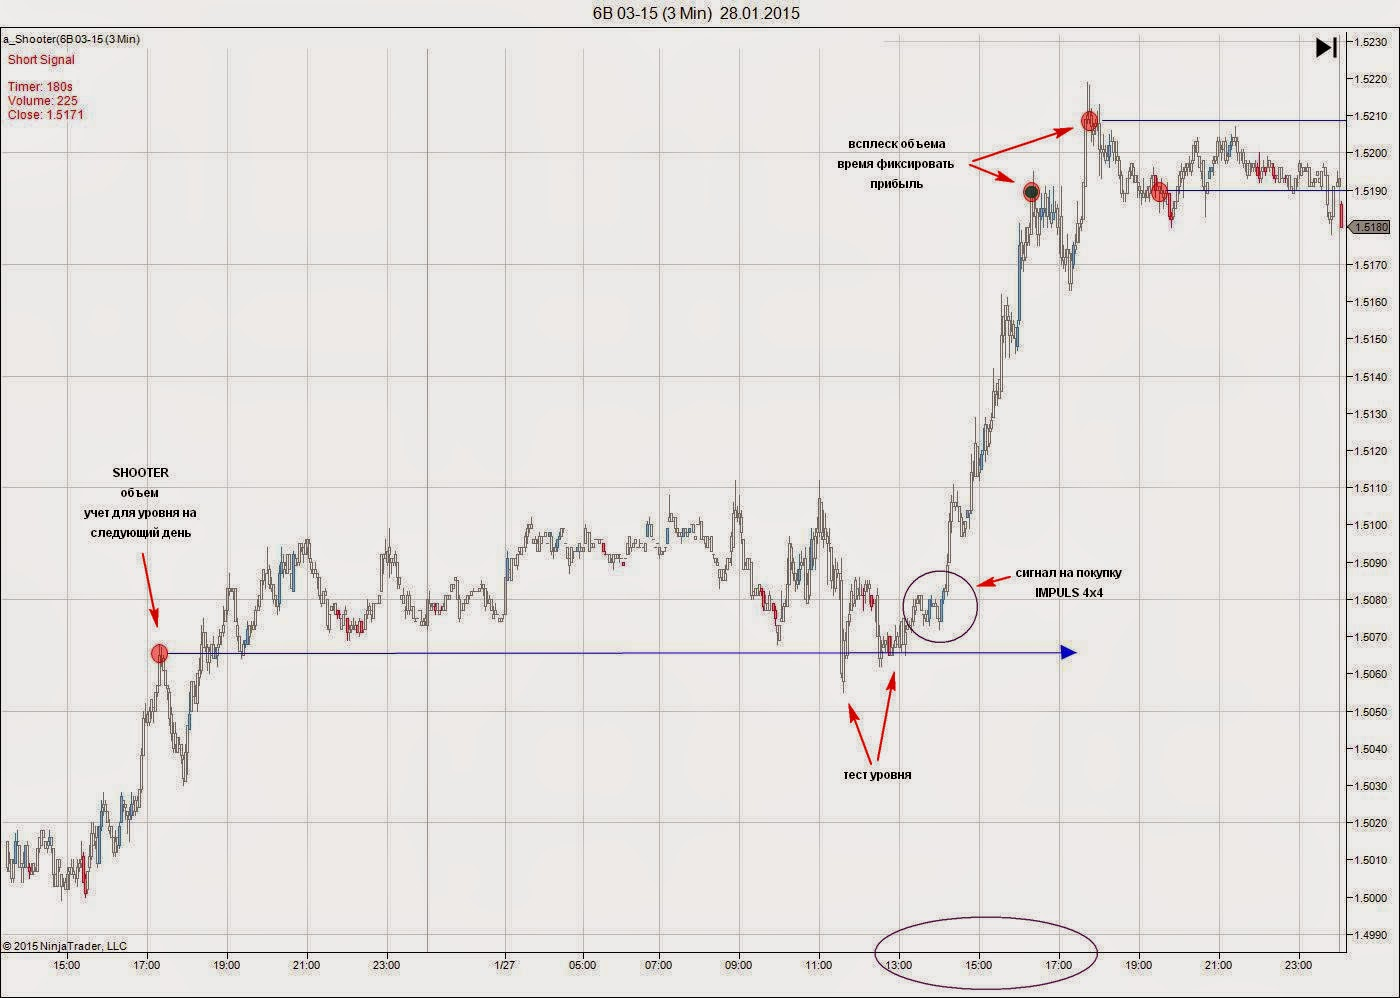 Shooter - влияние объемов торгов на движение цены 6B%2B03-15%2B(3%2BMin)%2B%2B28_01_2015